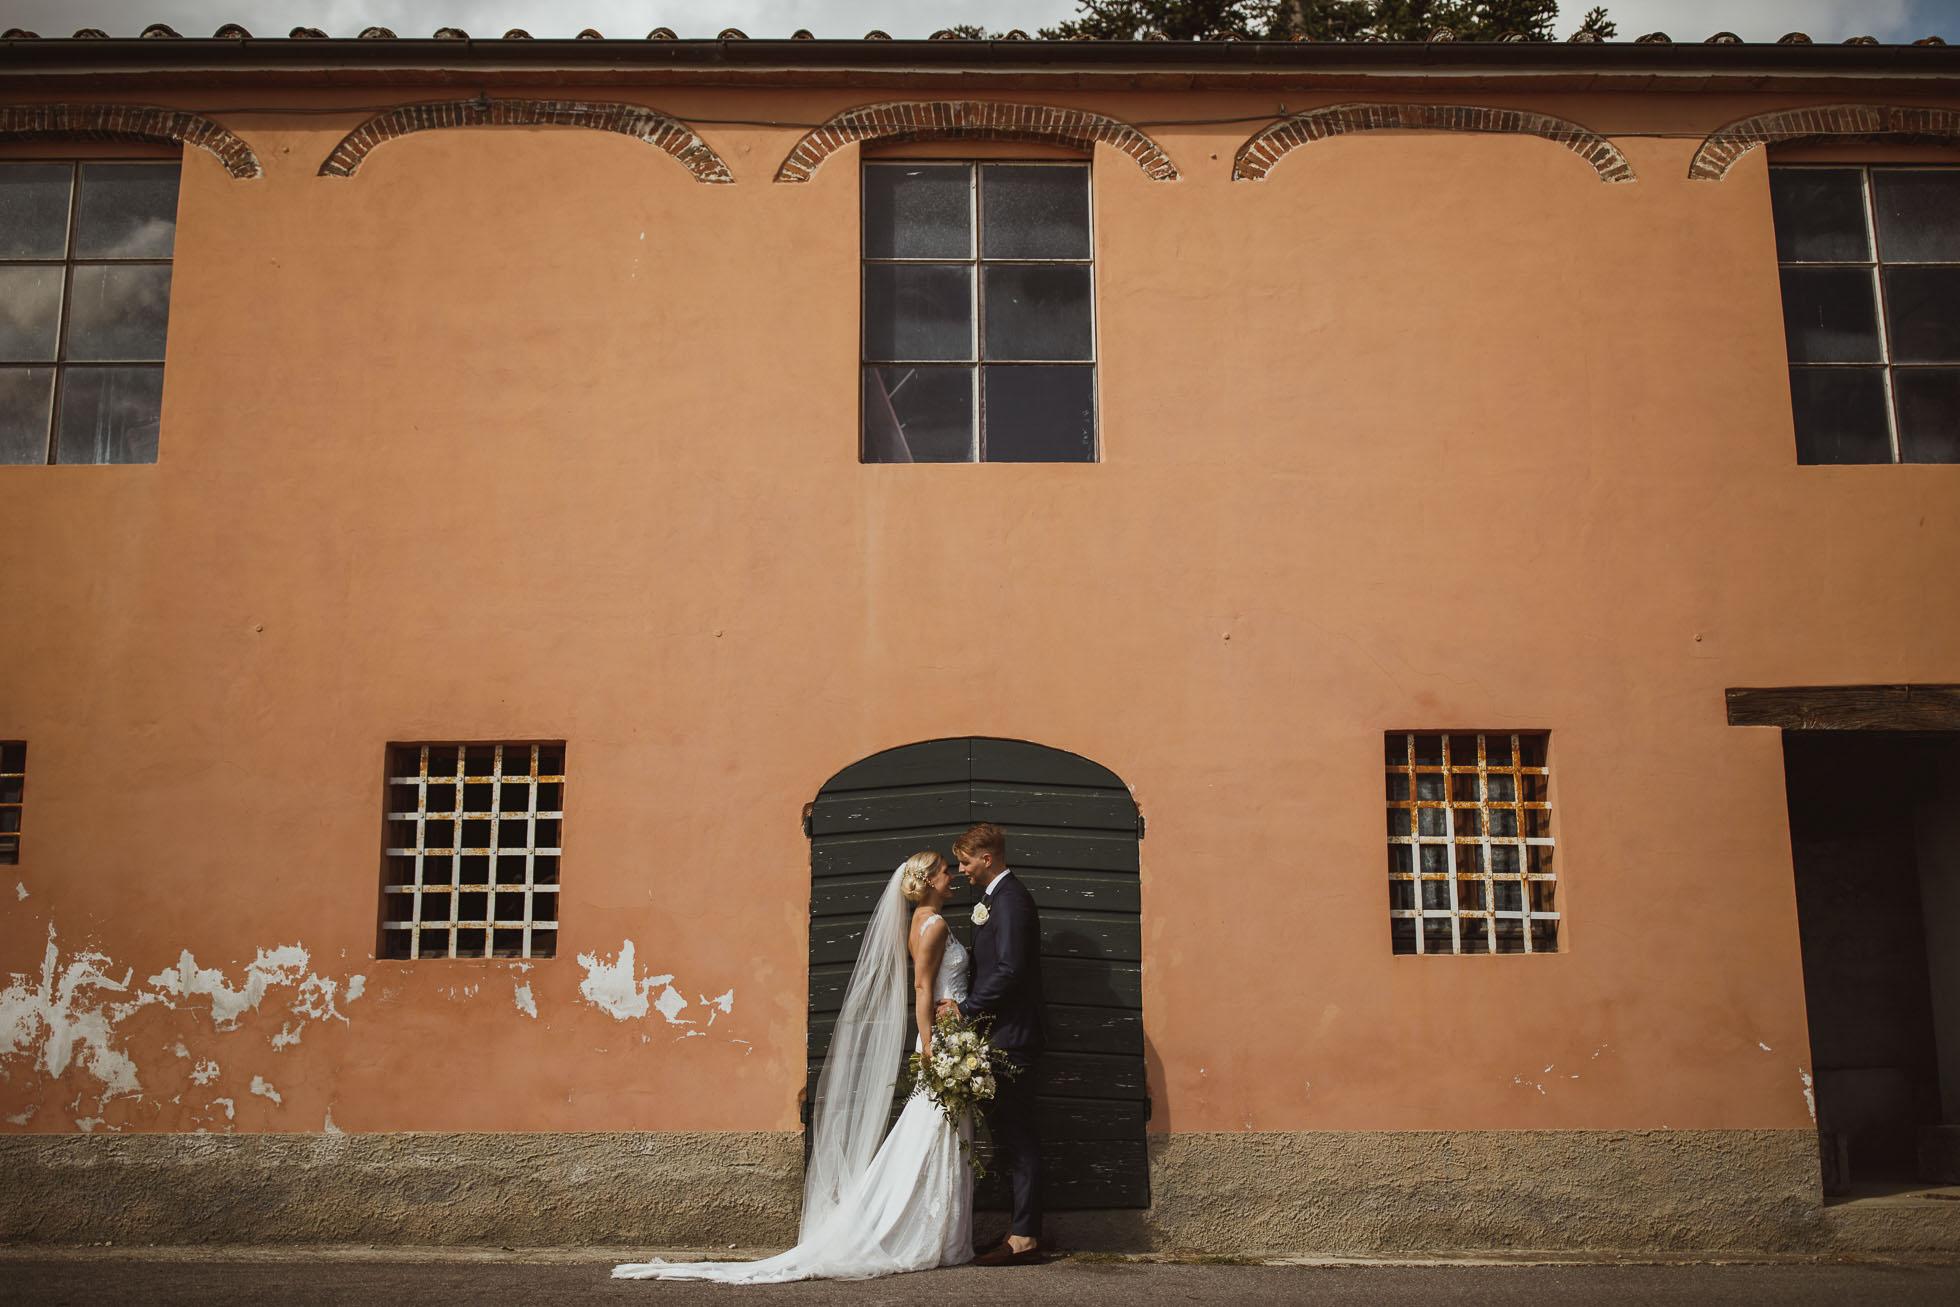 tenuta_san_pietro_wedding_photographer-47.jpg